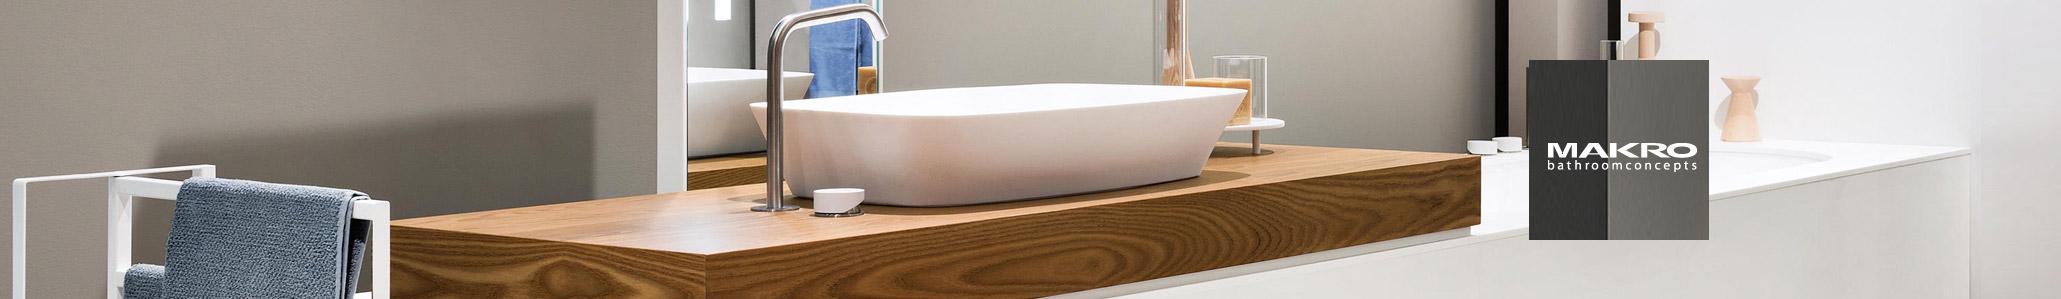 Arredo bagno Mantova - Floordeco a Castel Goffredo MN